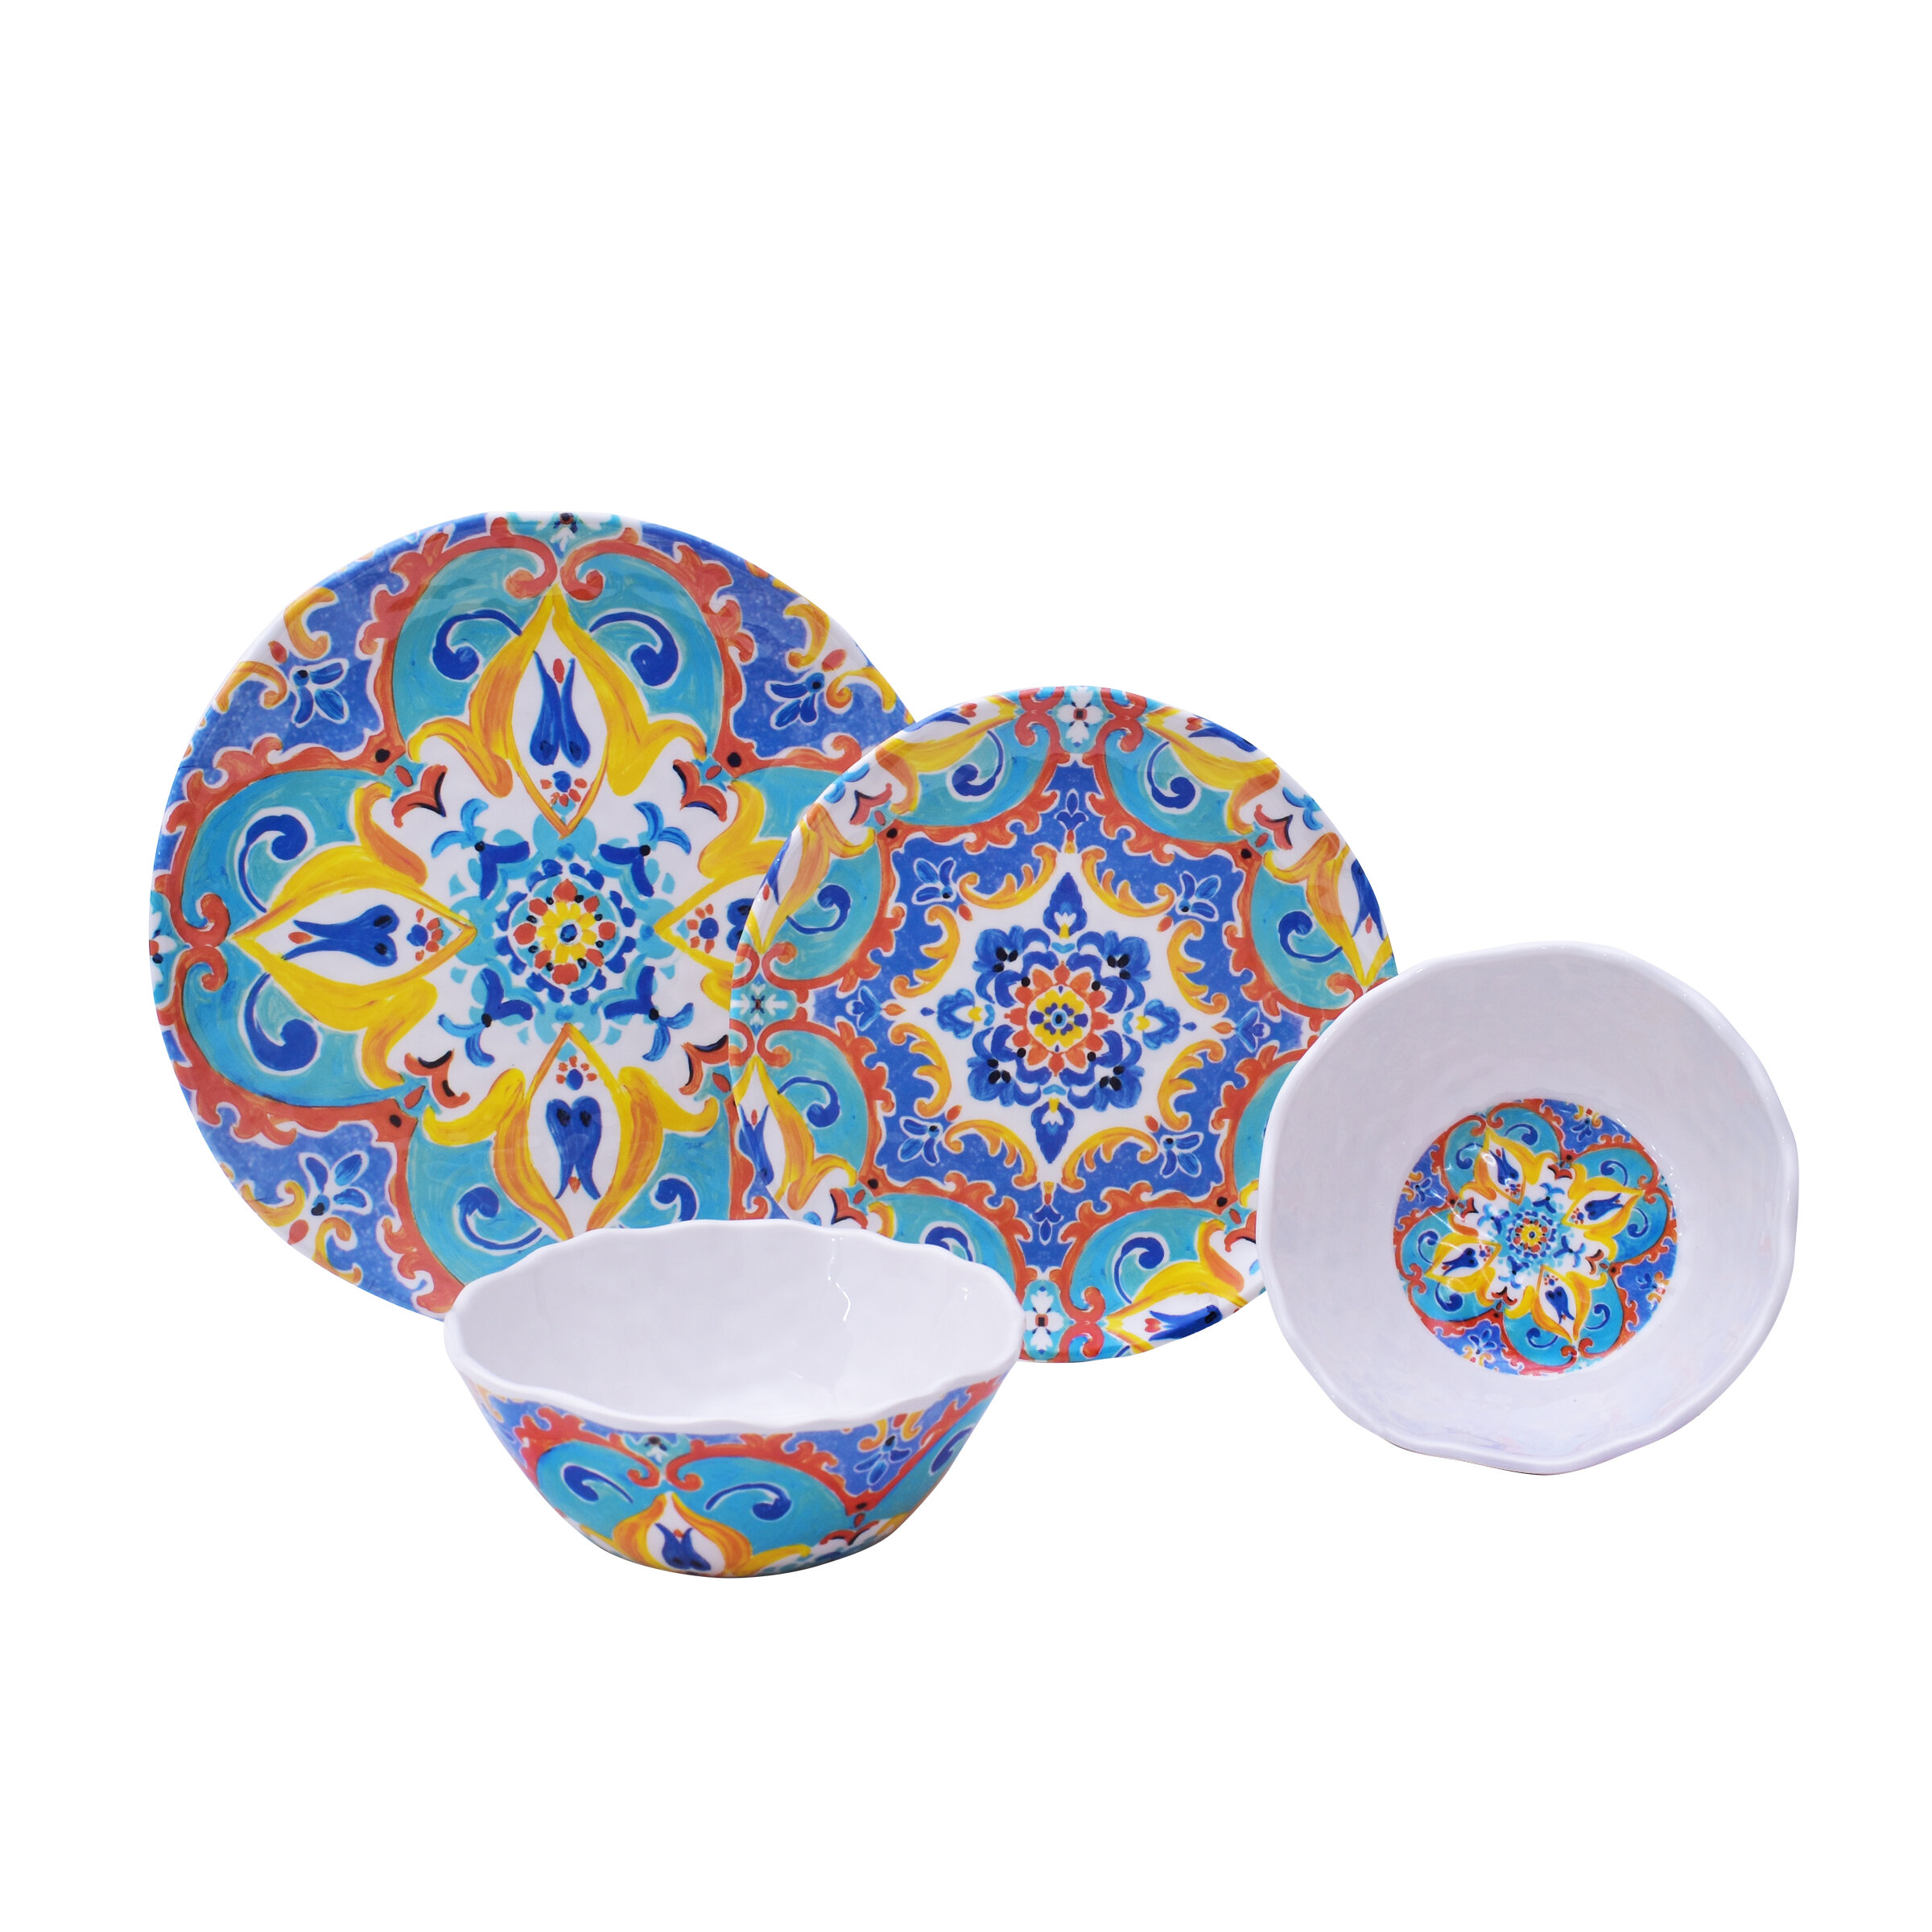 sc 1 st  Joss \u0026 Main & Romella 12 Piece Melamine Dinnerware Set Service for 4 | Joss \u0026 Main